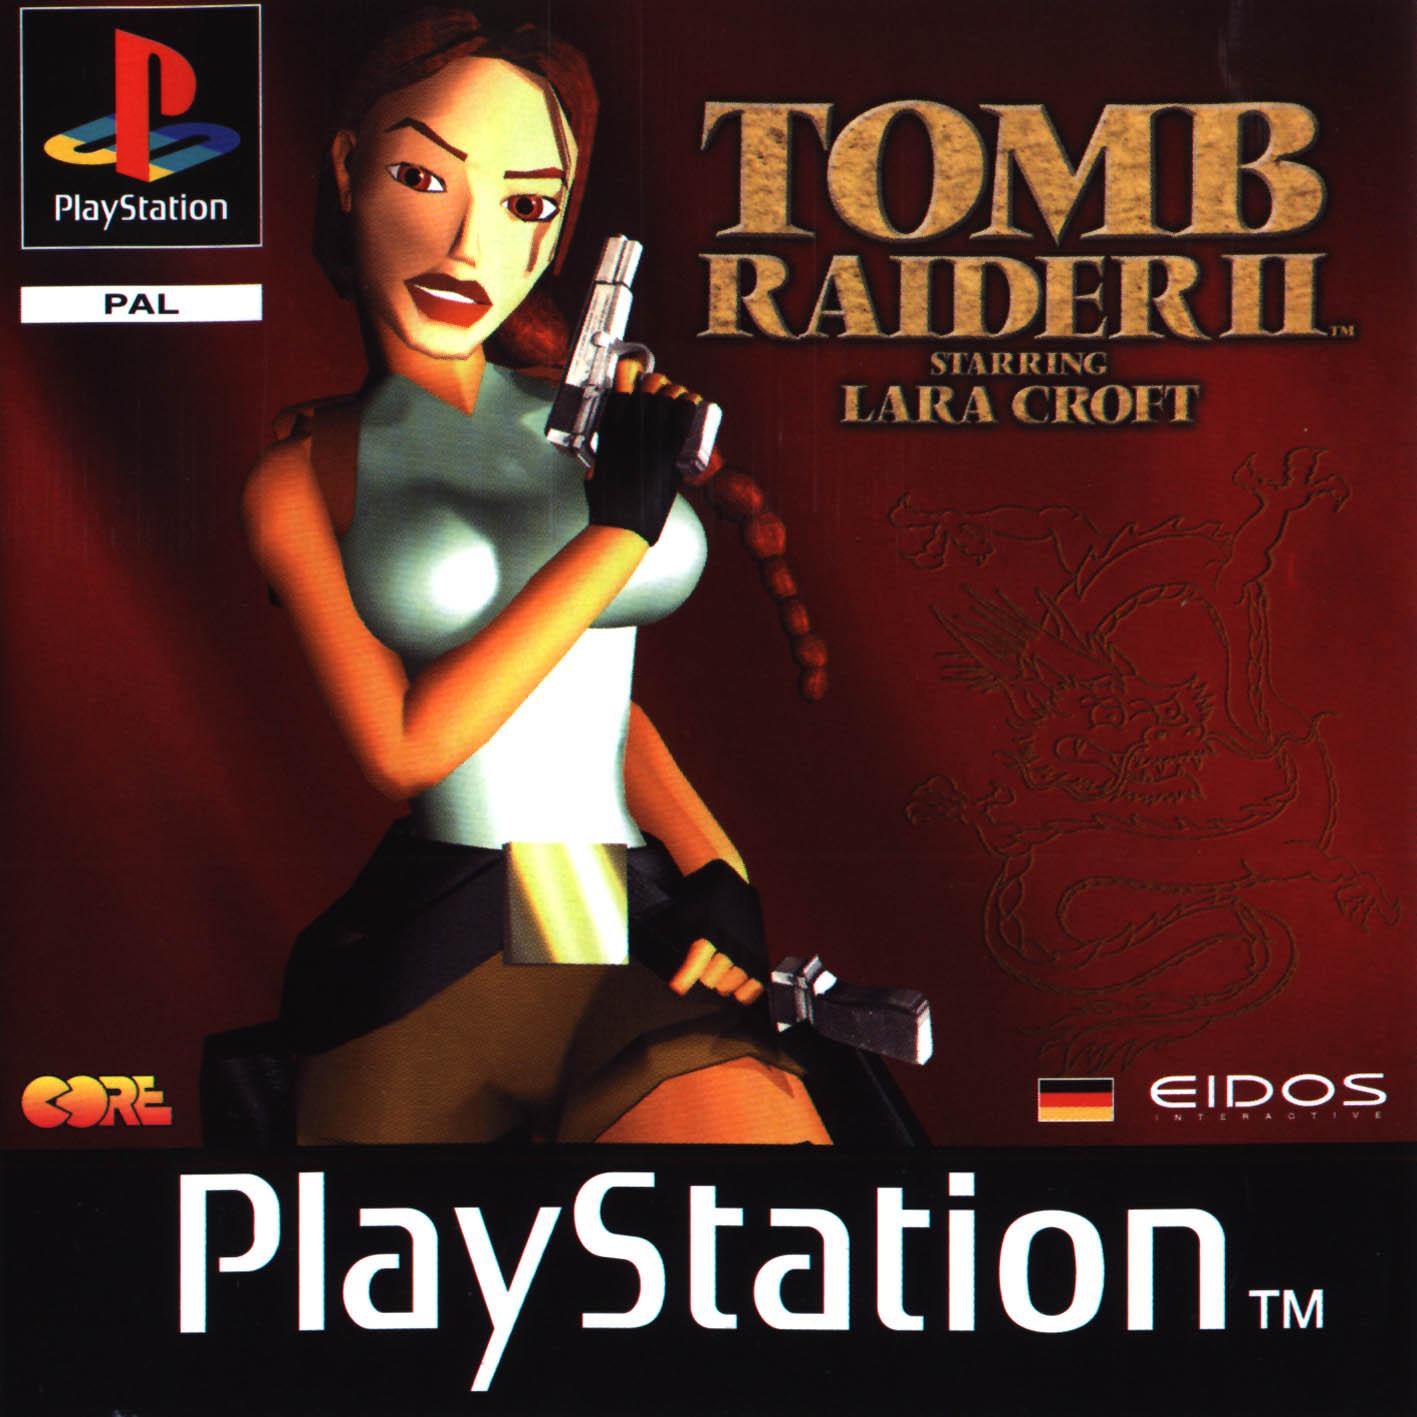 Recensione Tomb raider 3